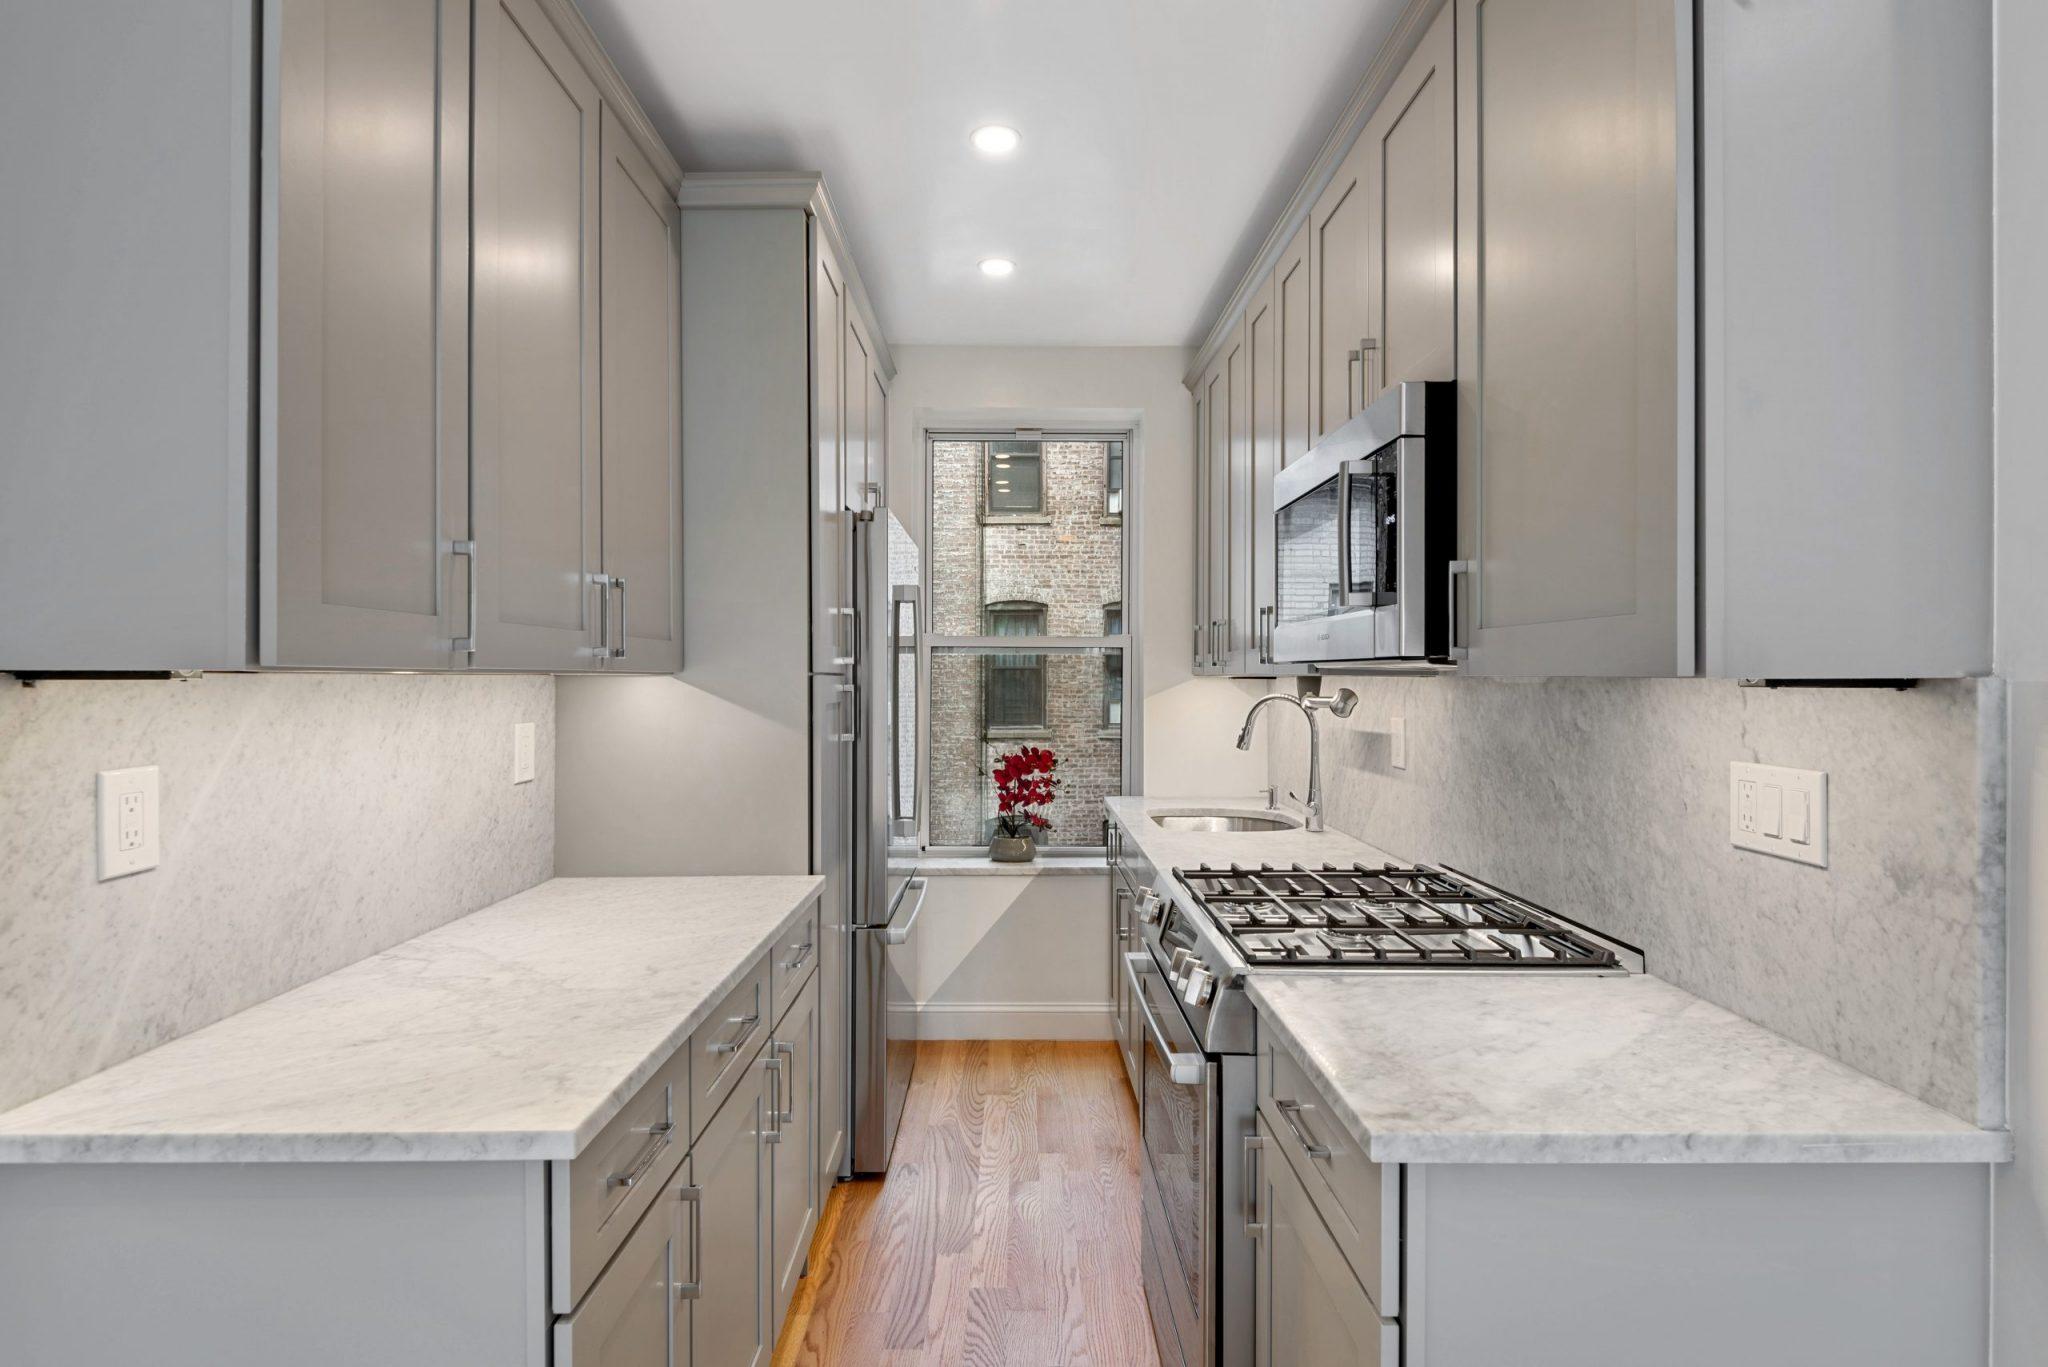 624 West 207th Street Apt 23 New York, NY  10034